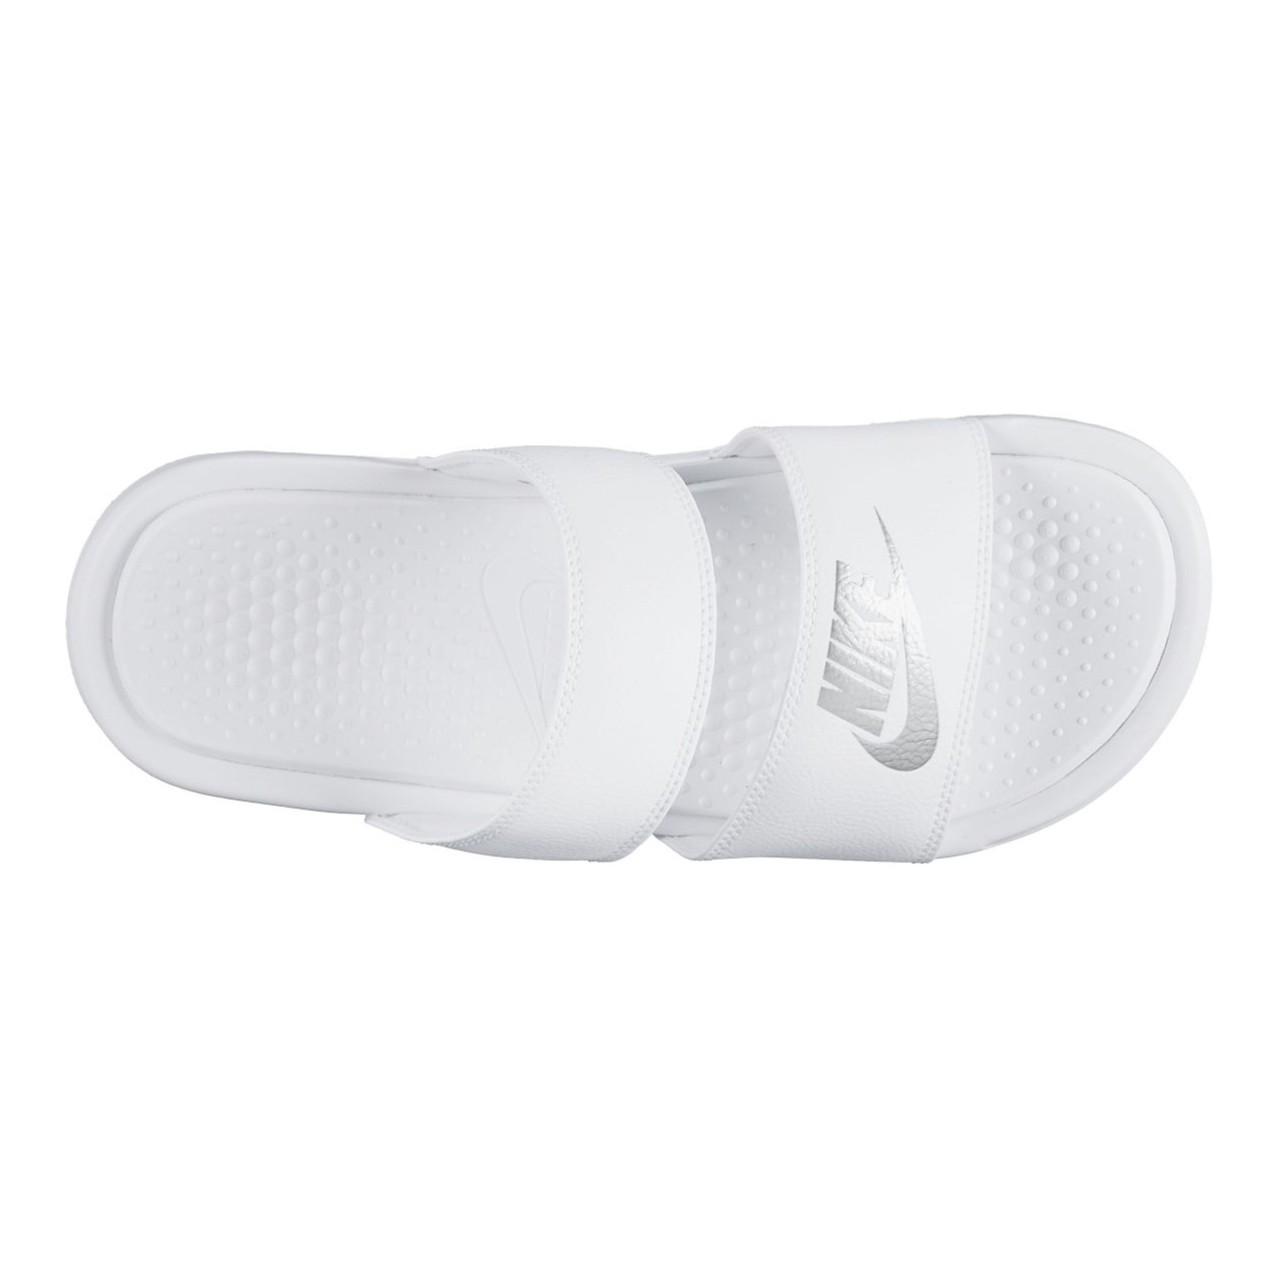 buy online 9f2c3 81b29 Dámské pantofle Nike WMNS BENASSI DUO ULTRA SLIDE